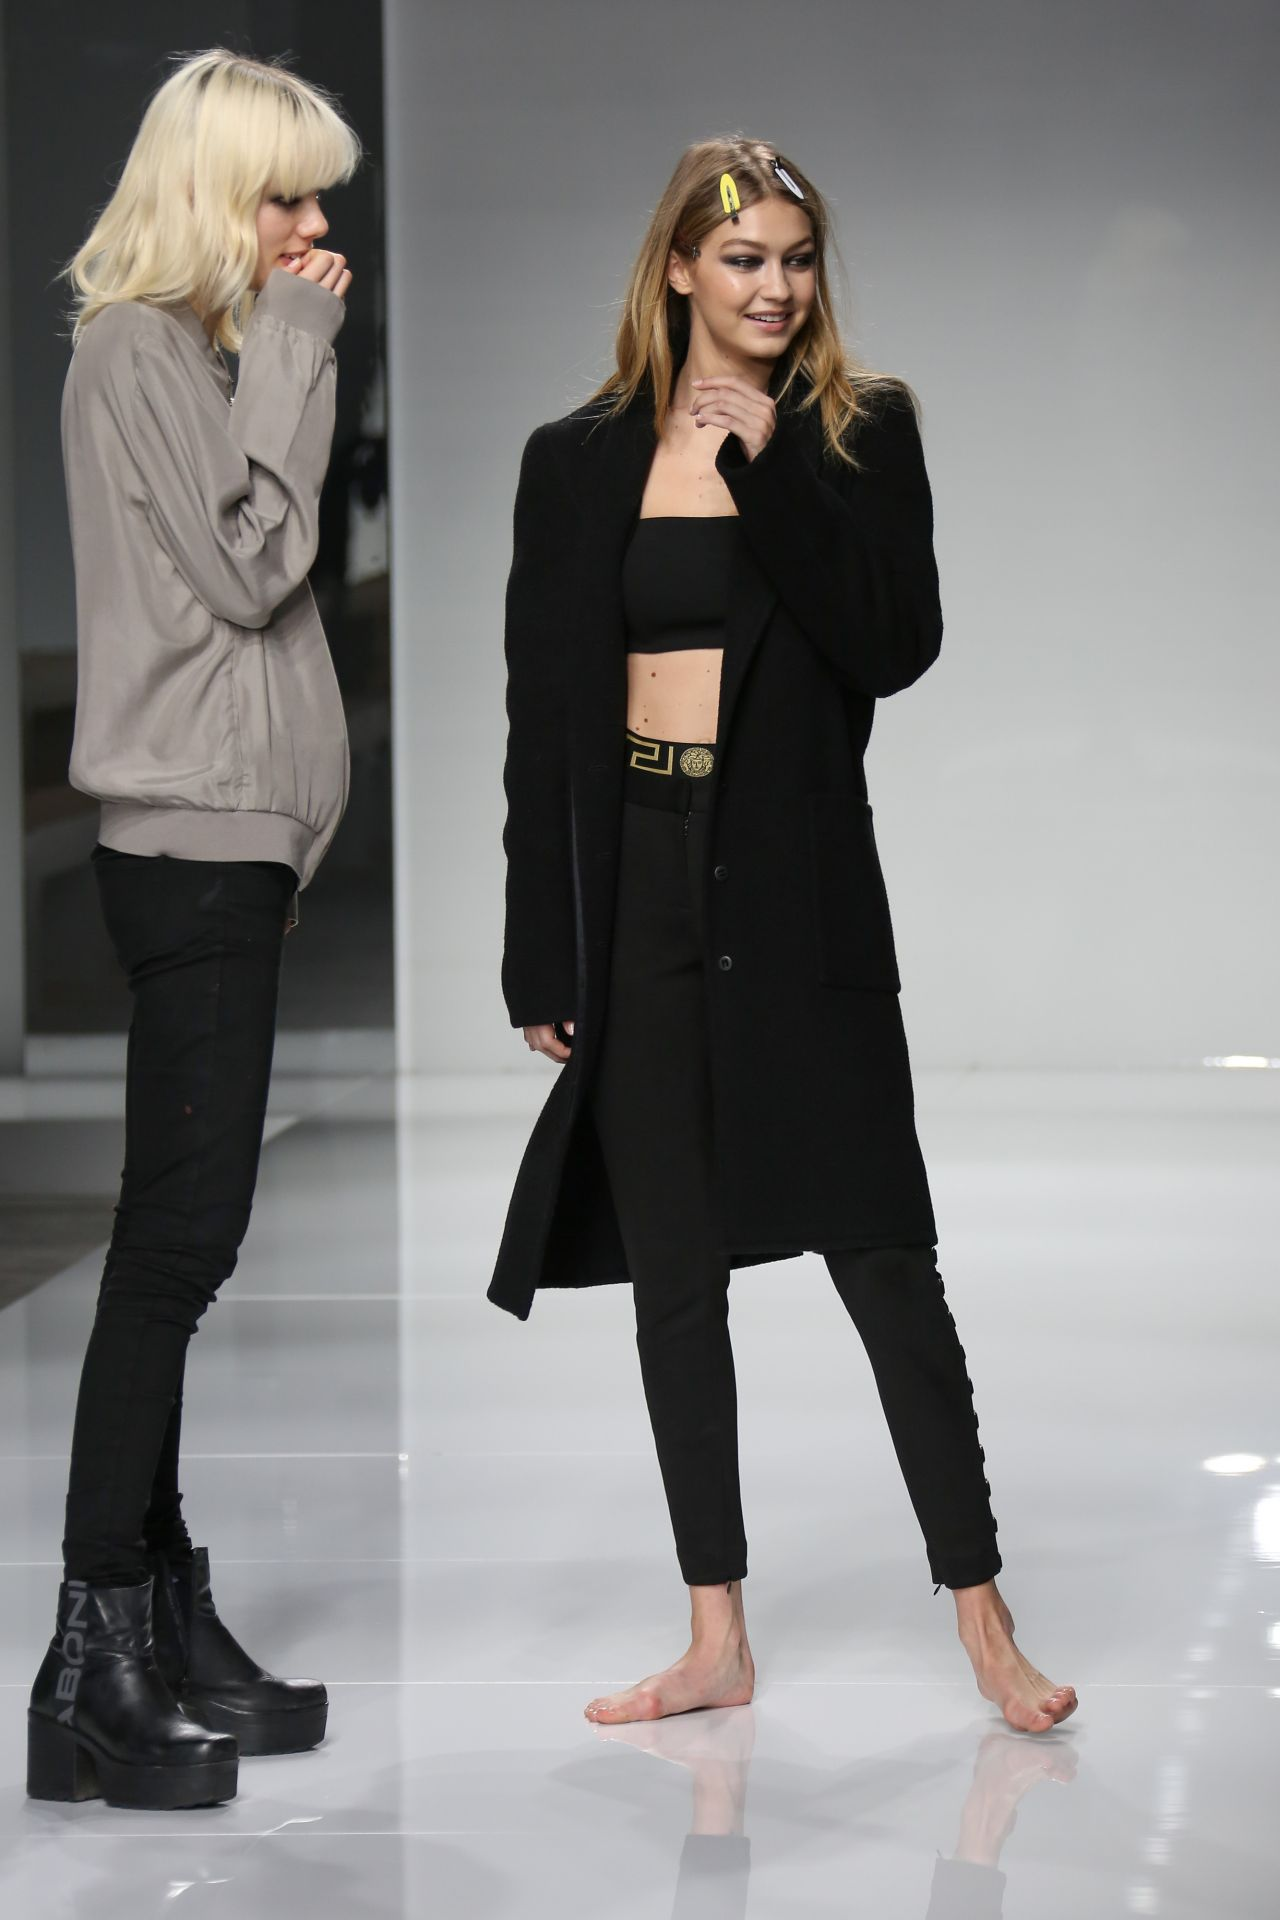 Gigi Hadid Versace Catwalk Before The Haute Couture